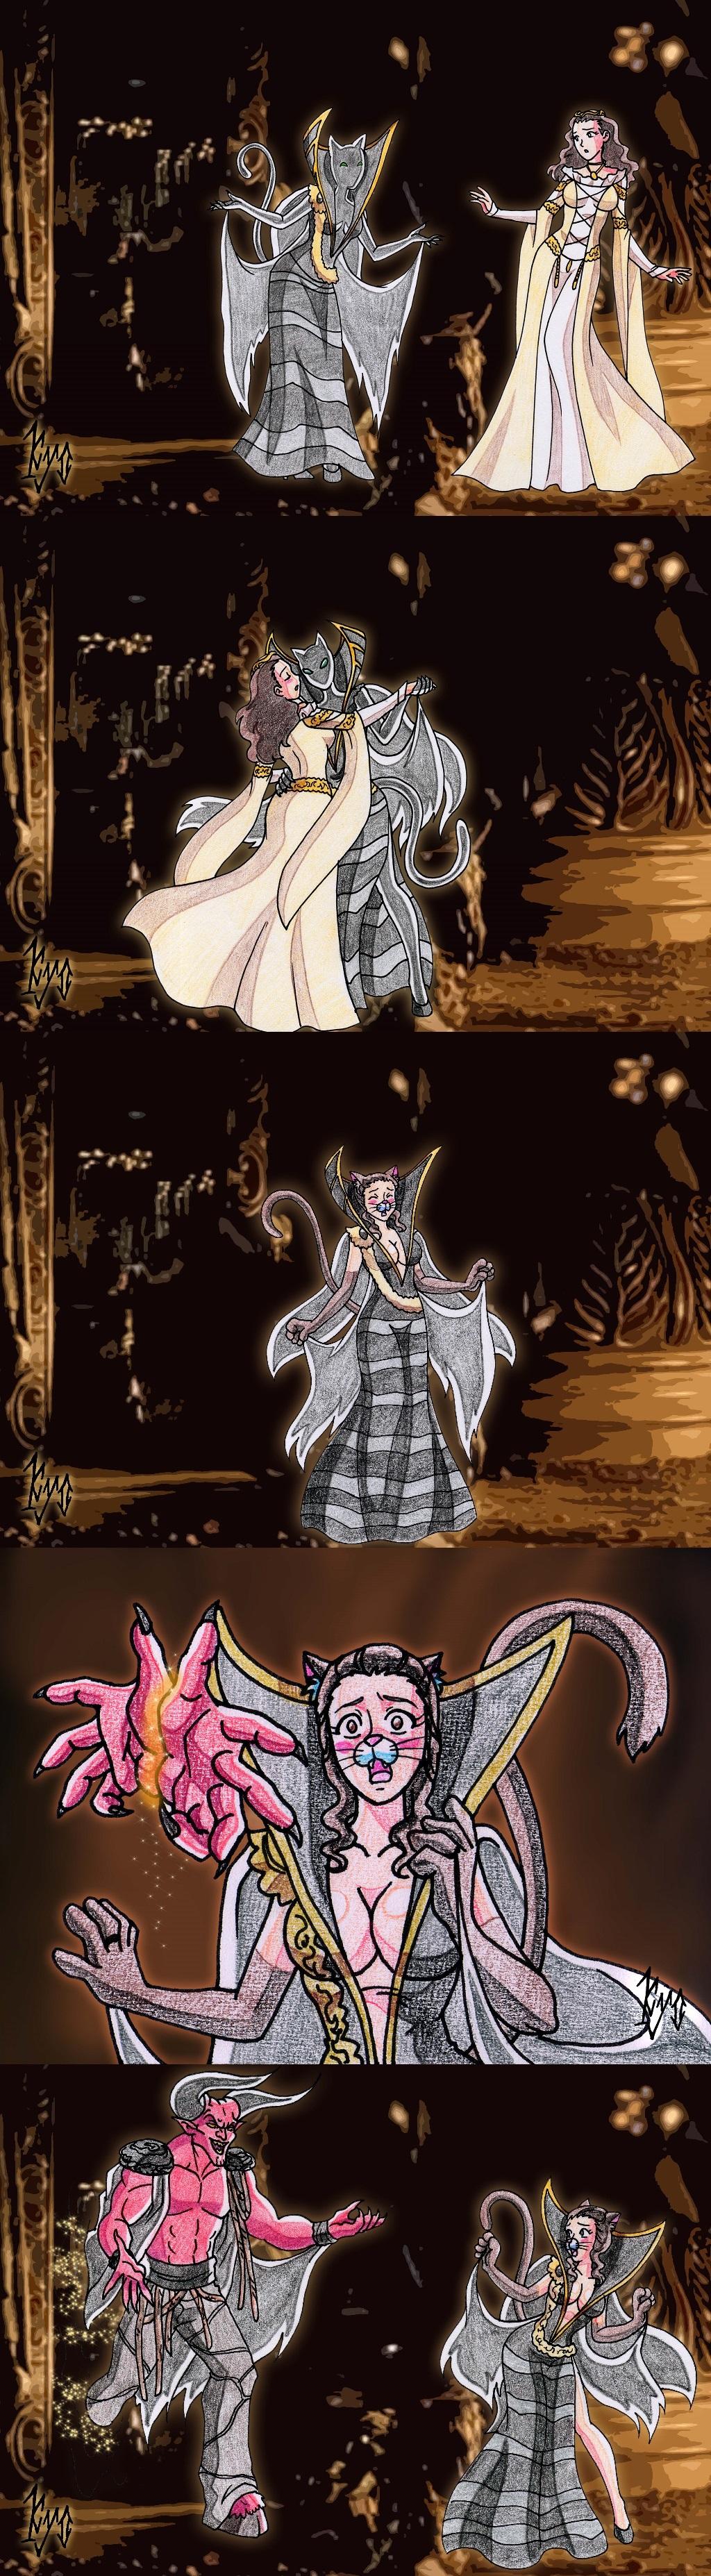 Legend - Seduced by Darkness (Kyo)